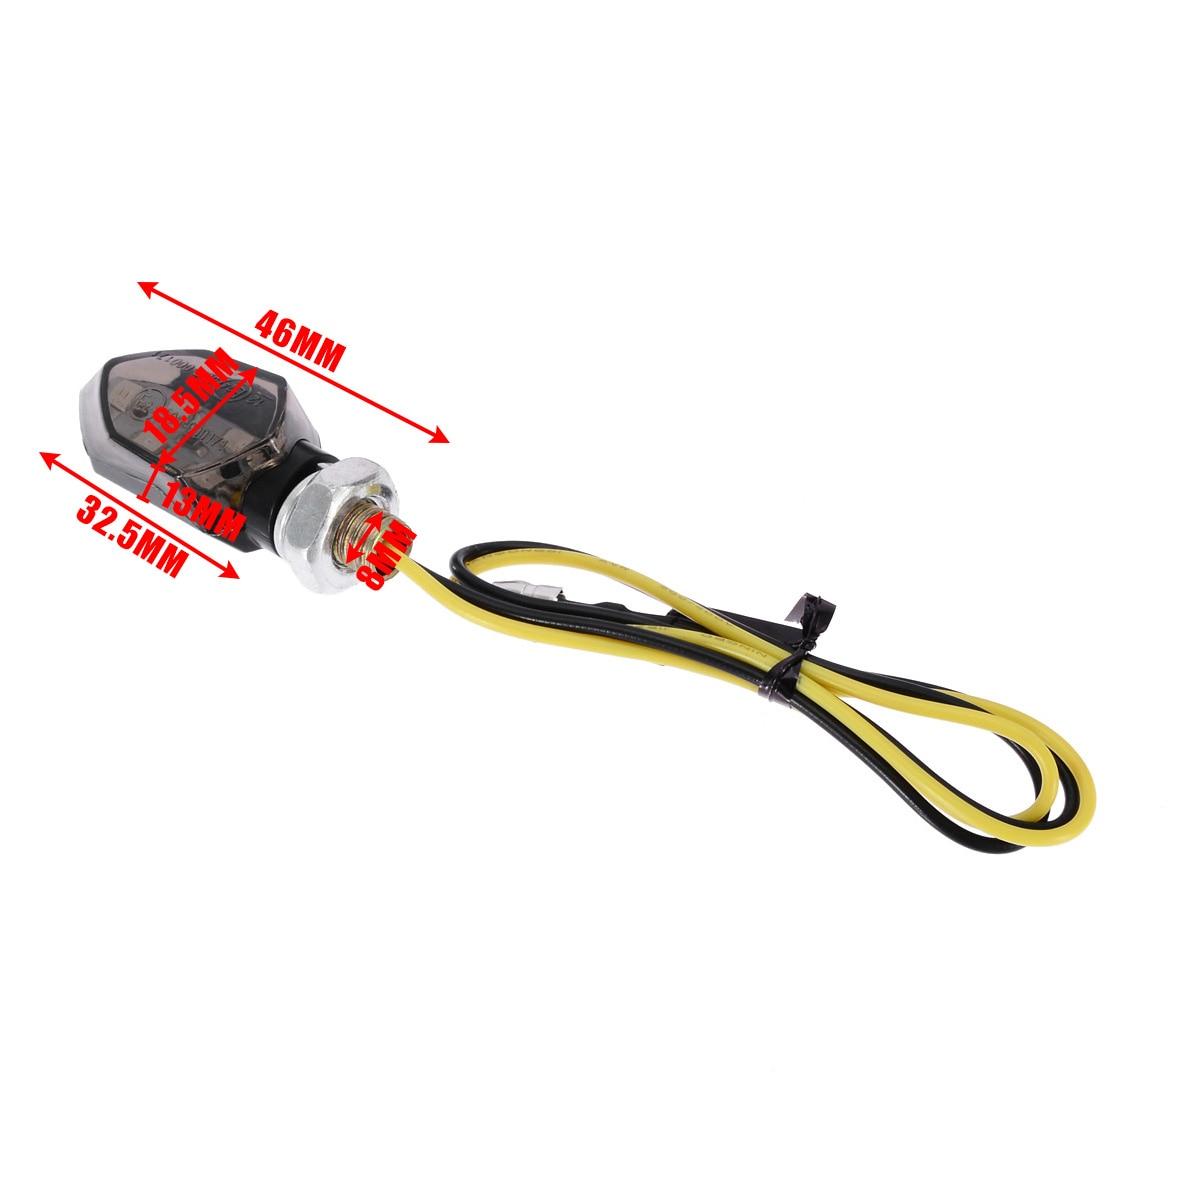 Image 5 - 2pcs 12V Mini Motorcycle 5LED Amber Turn Signal Indicator Light Blinker ABS Plastic Housing Integrated PC Smoke Lens